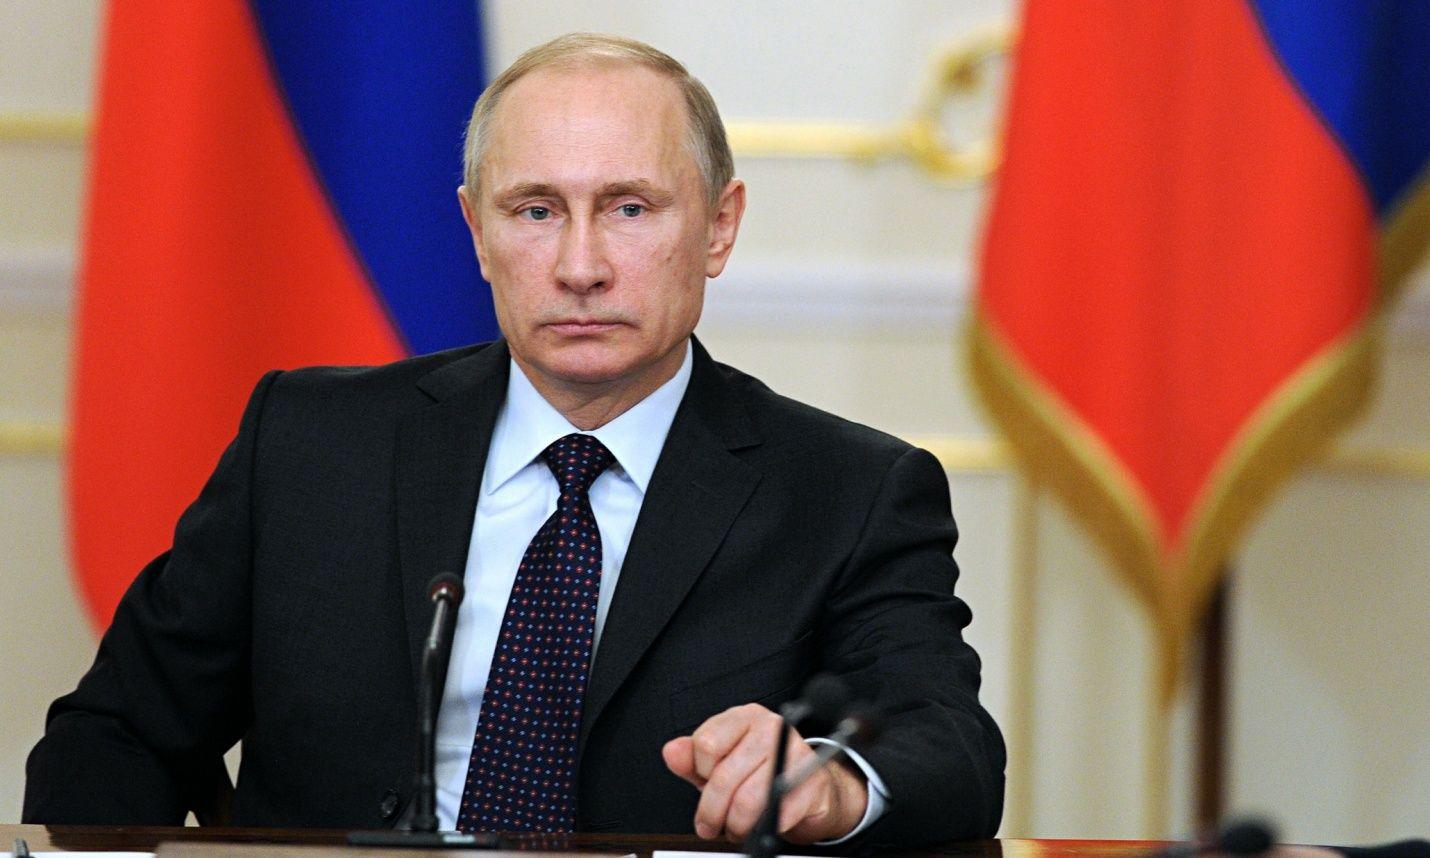 Владимир Путин о выборах президента-2018: Я еще ничего не решил - Kapital.kz